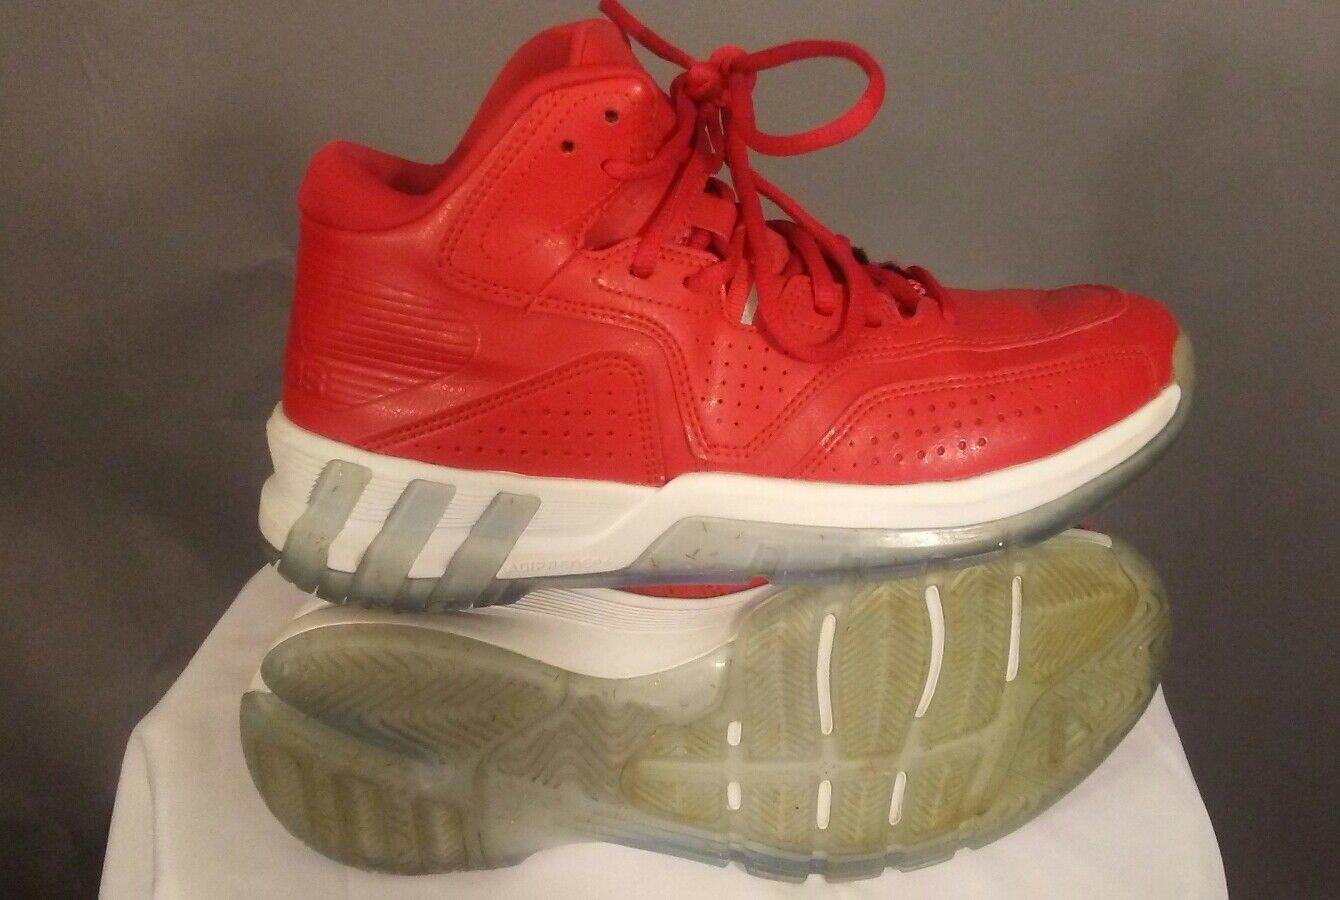 Adidas d howard 6 dwight howard scarpe red basket scarpe howard uomini '39 a91cc2